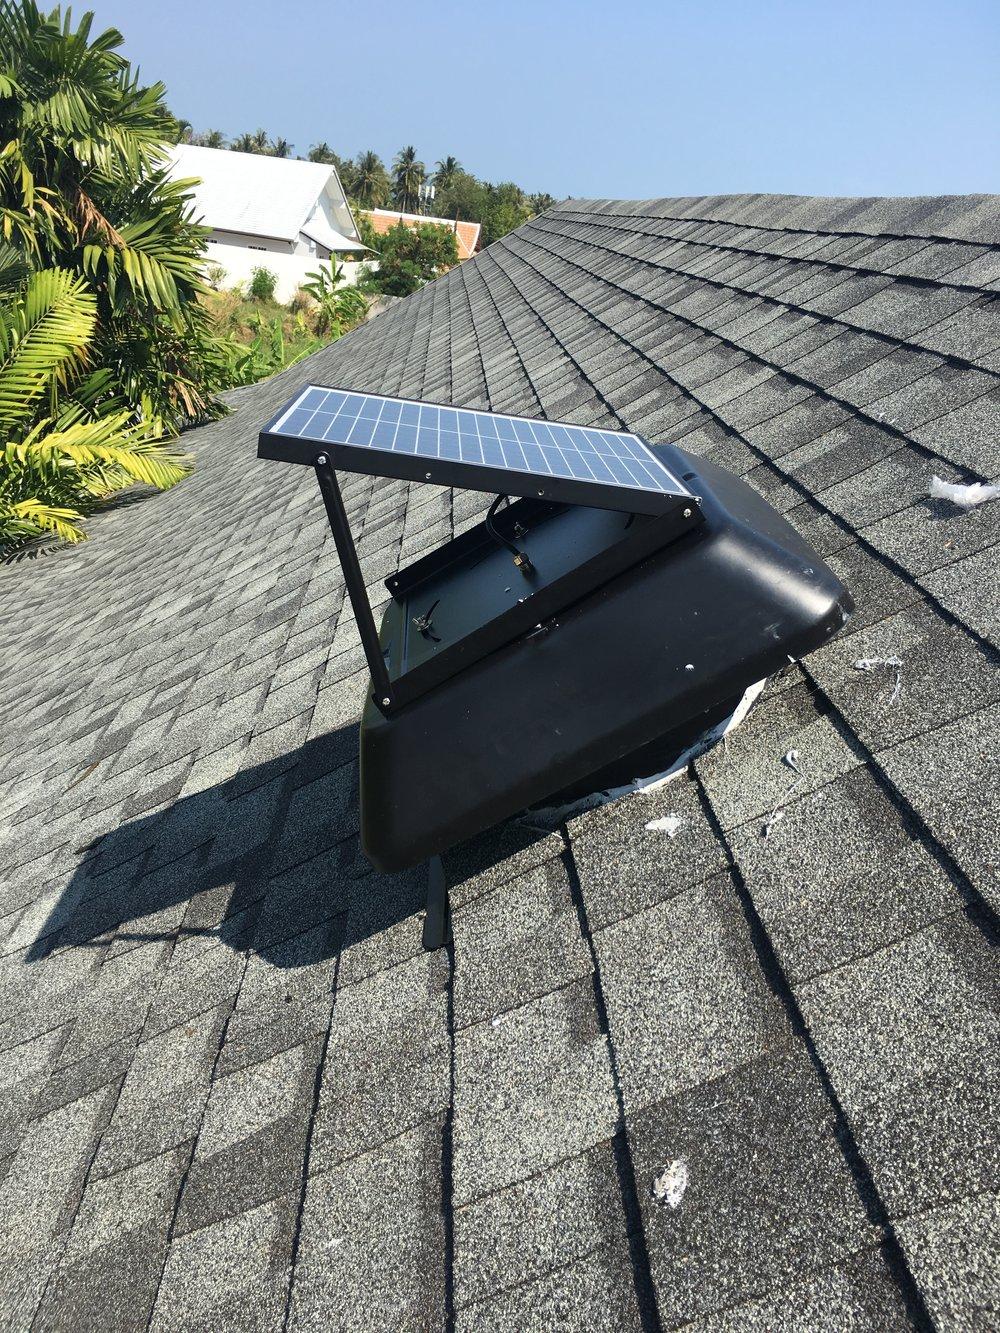 Solar panel angled to sun aspect